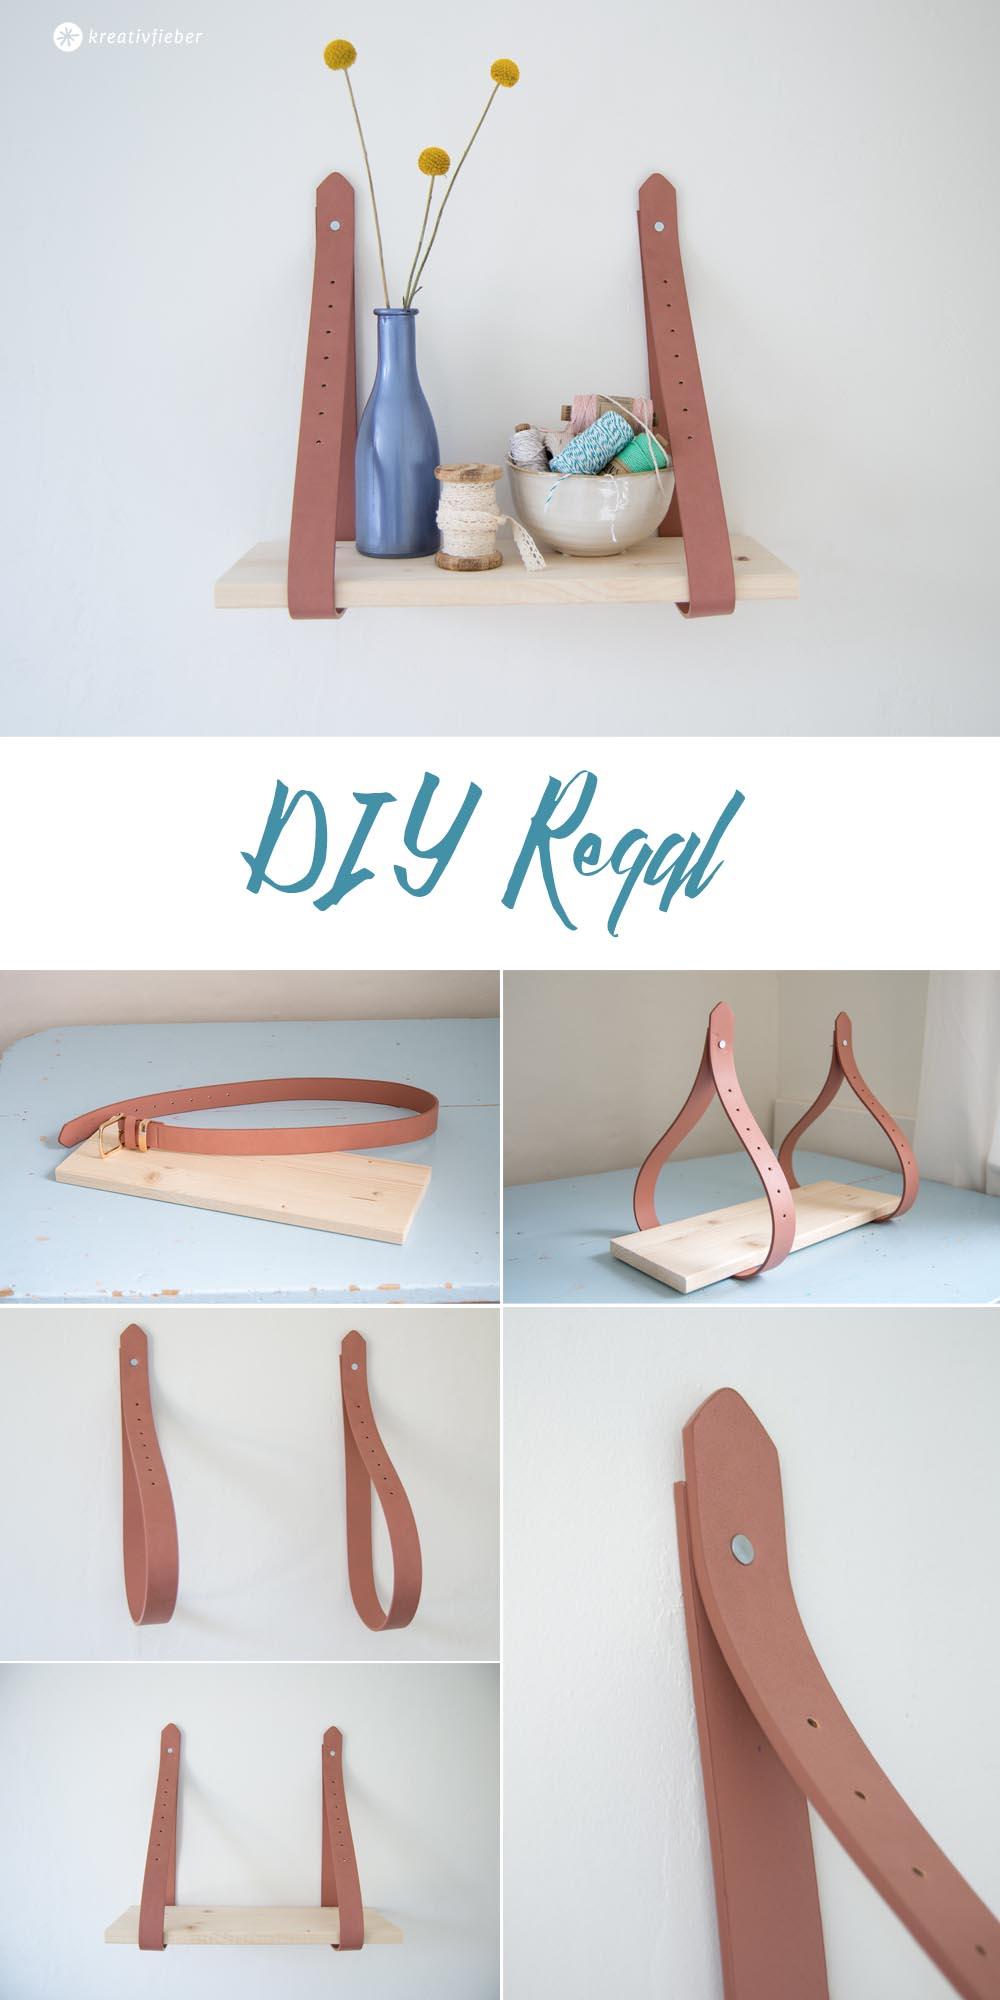 DIY Regal zum Aufhängen aus Gürteln